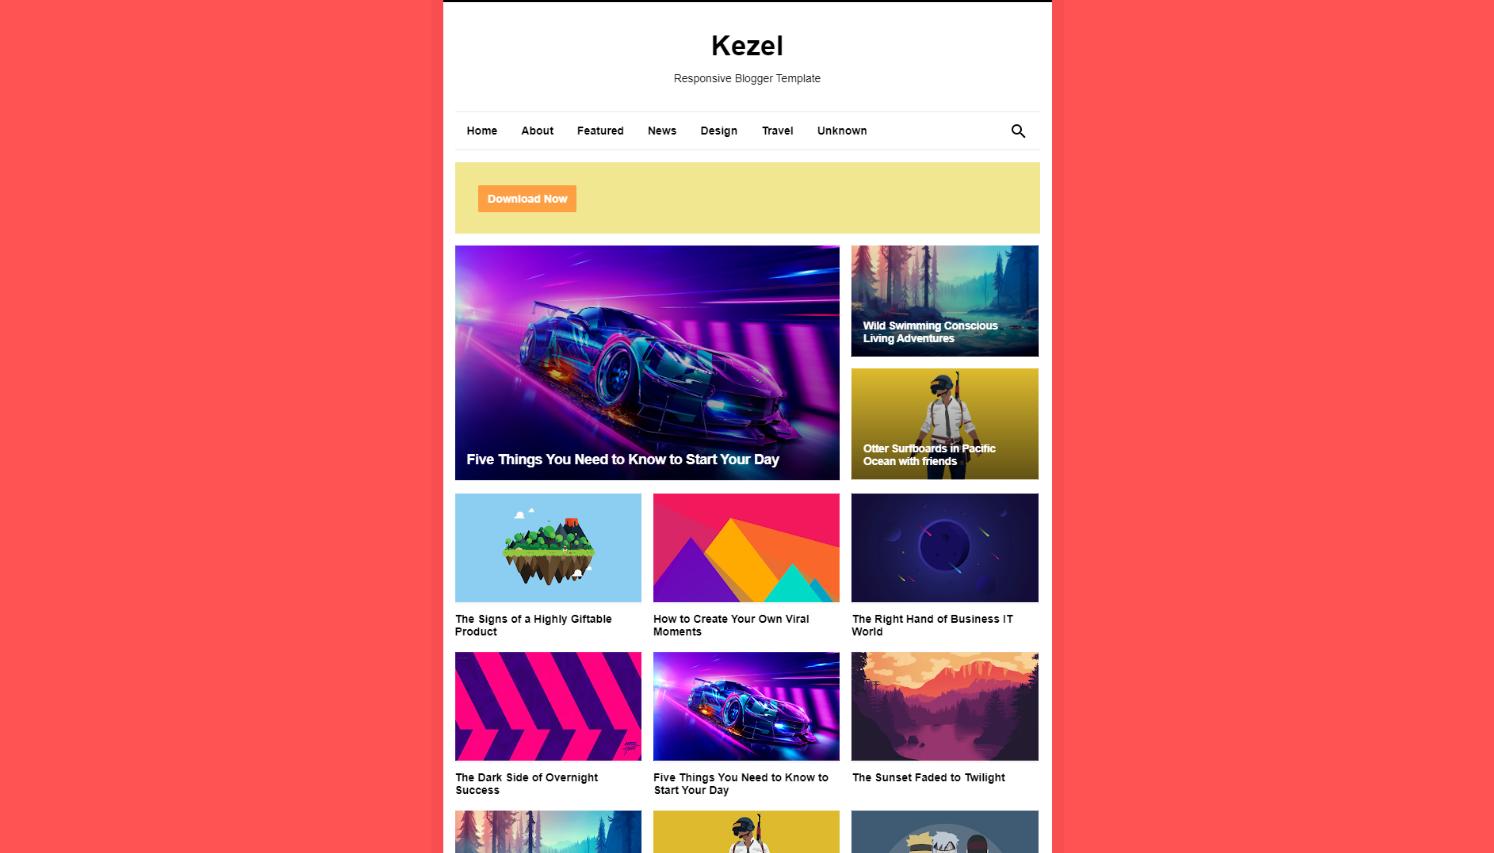 Kezel Pro Responsive Blogger Template